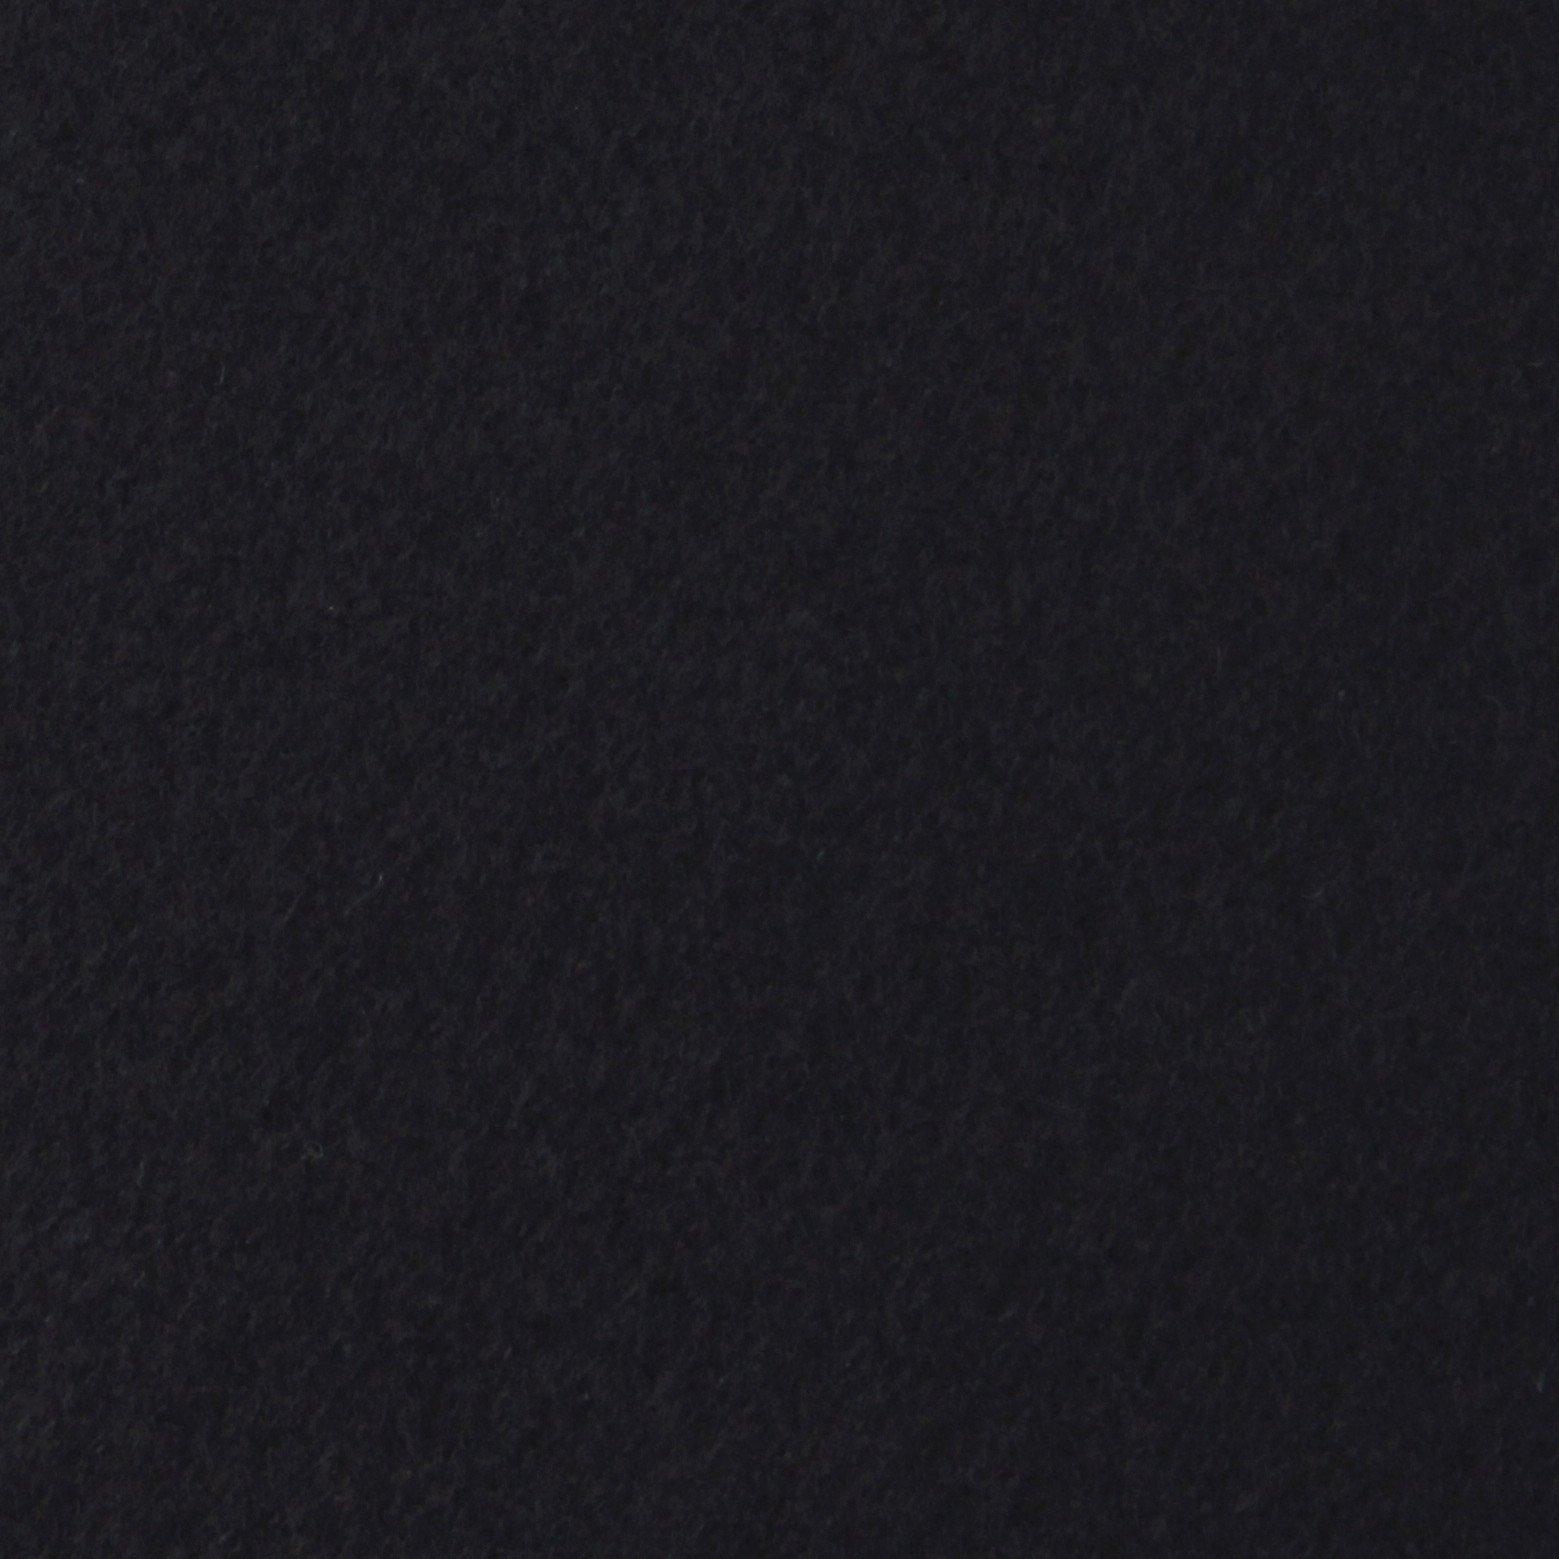 PROMO* FT-Wool Blend Felt 157-4941 Black